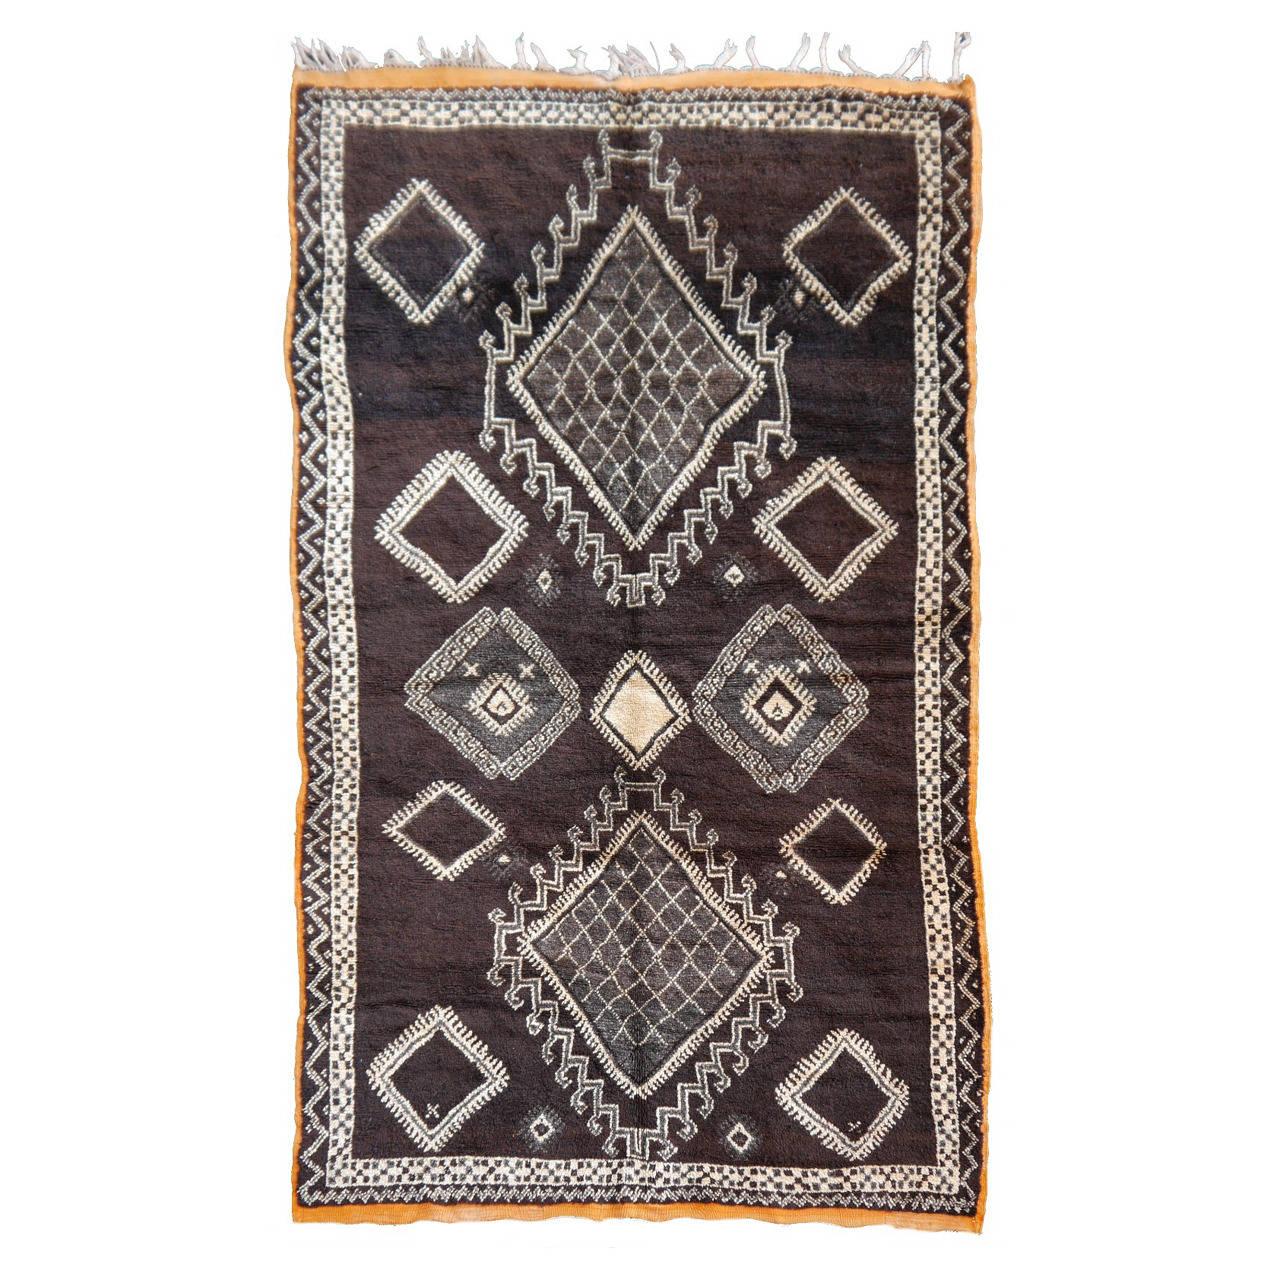 rare dark brown north african vintage berber rug with 22 diamonds